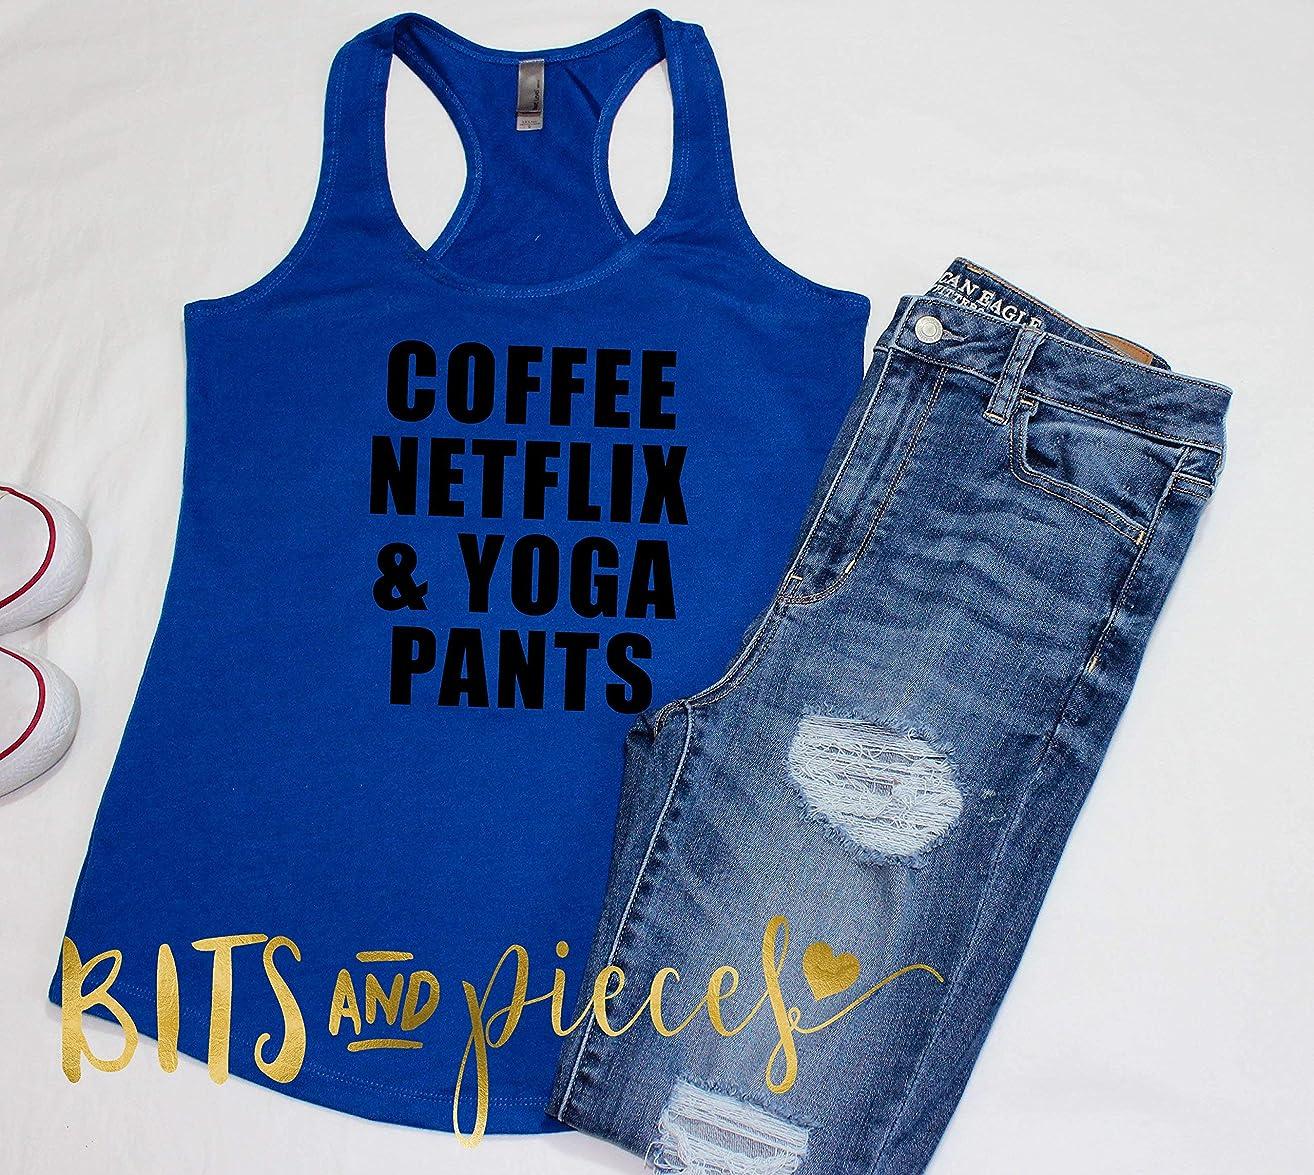 Coffee, Netflix, Yoga Pants   Women's   workout   tank top   t-shirt